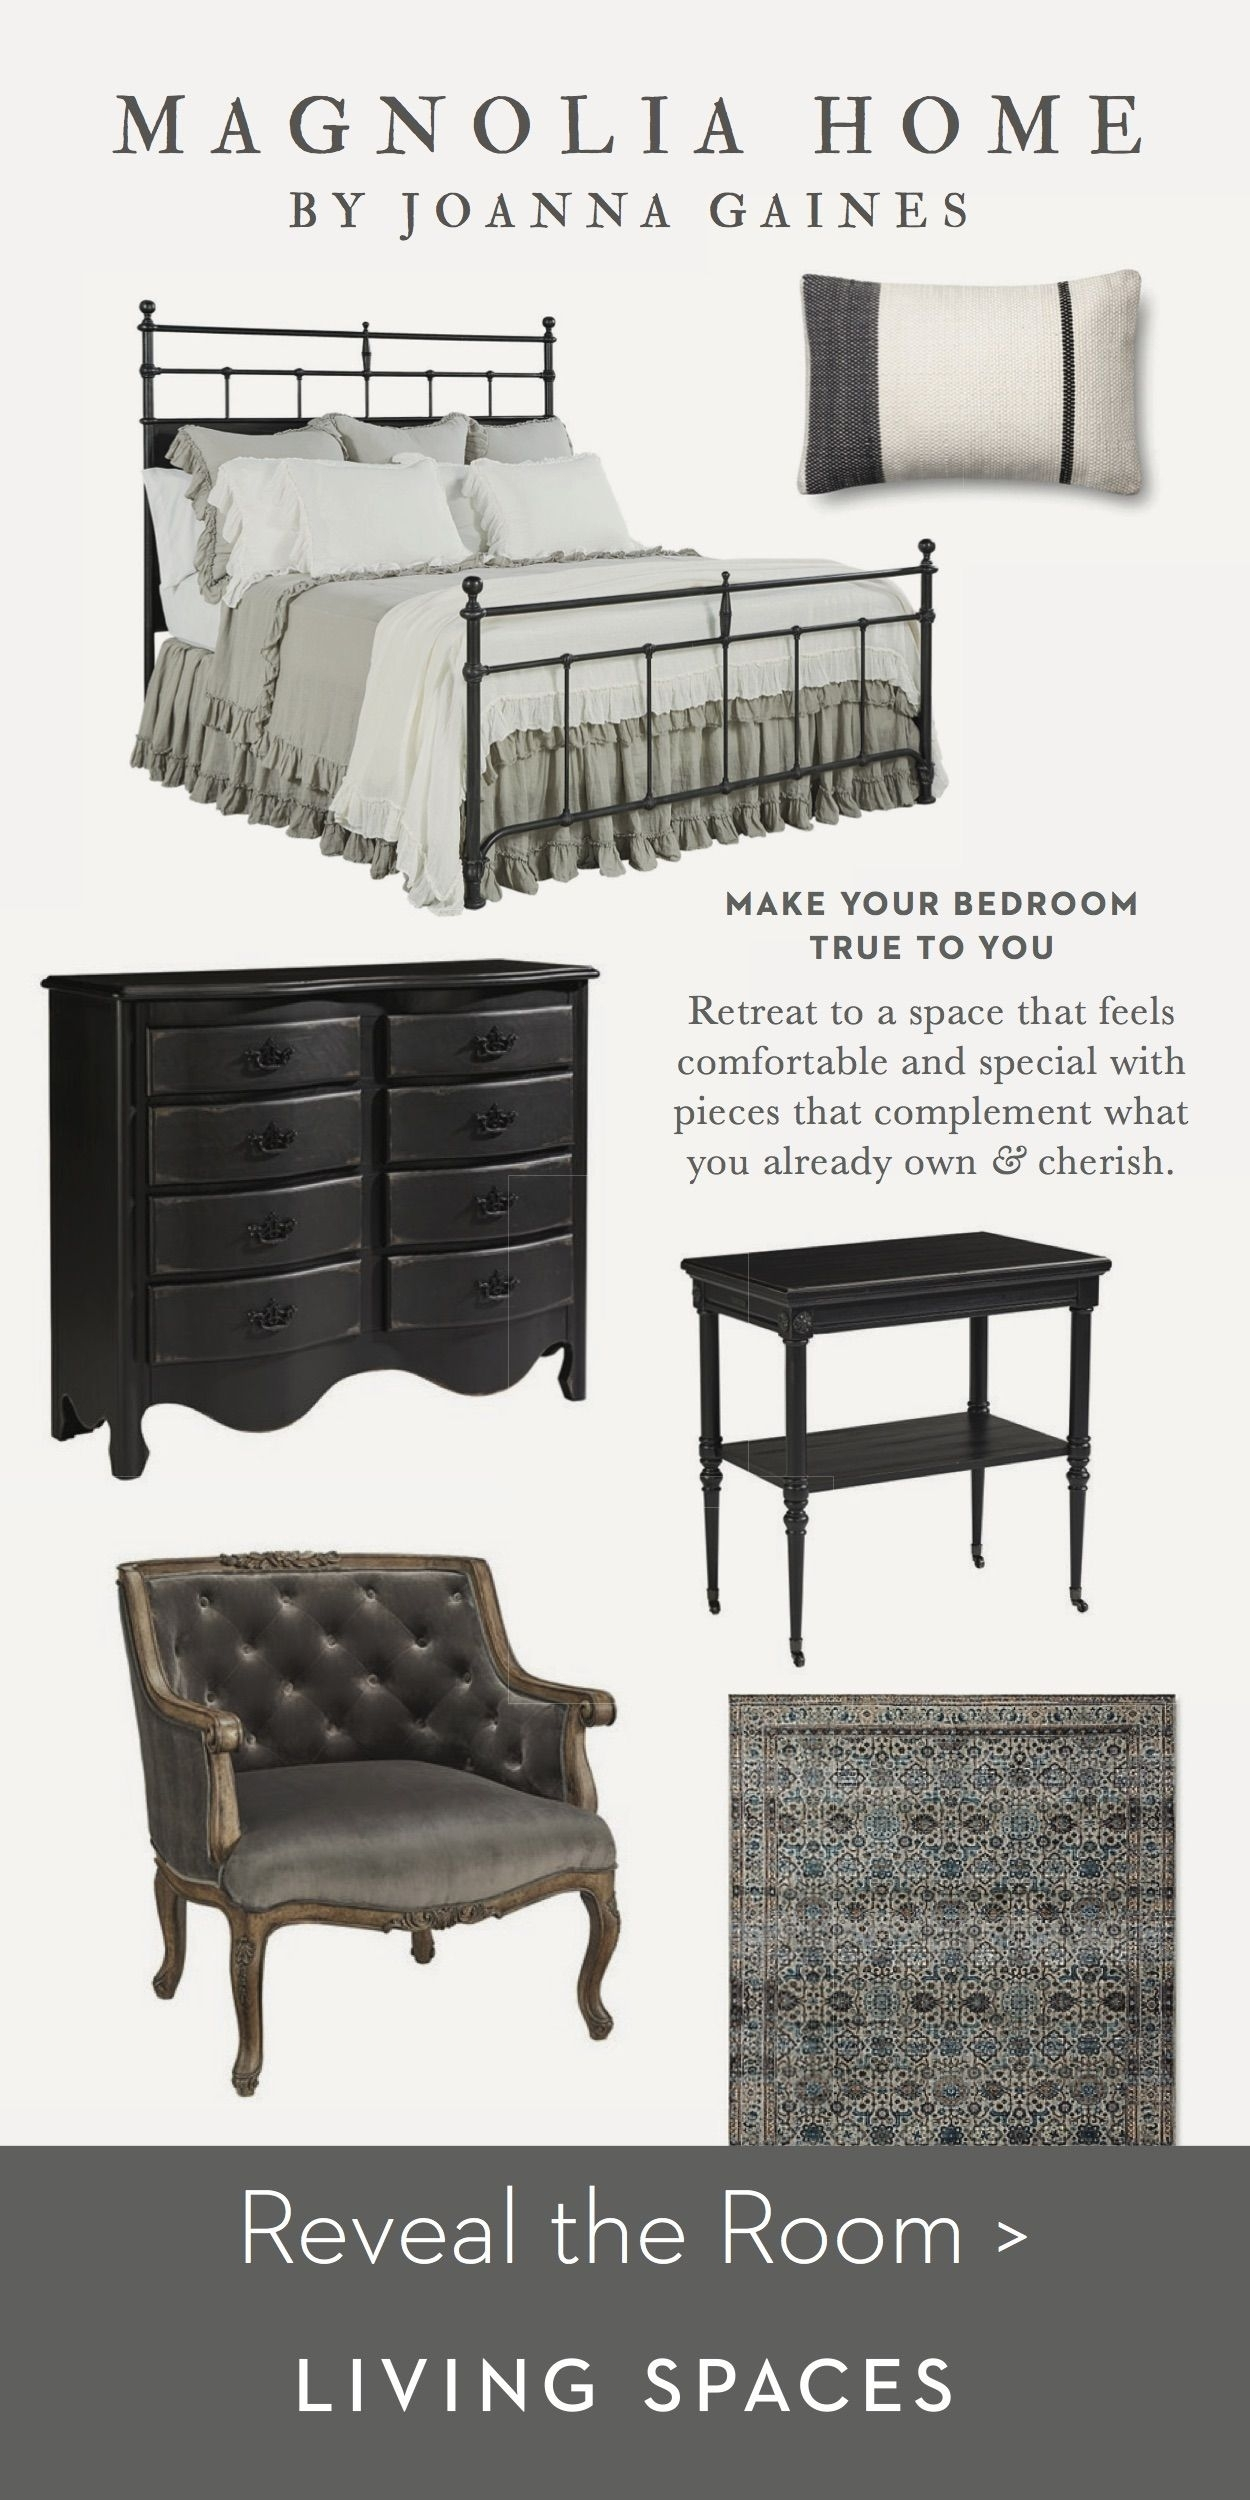 Magnolia Homejoanna Gaines| Bedroom Inspiration (Image 23 of 25)